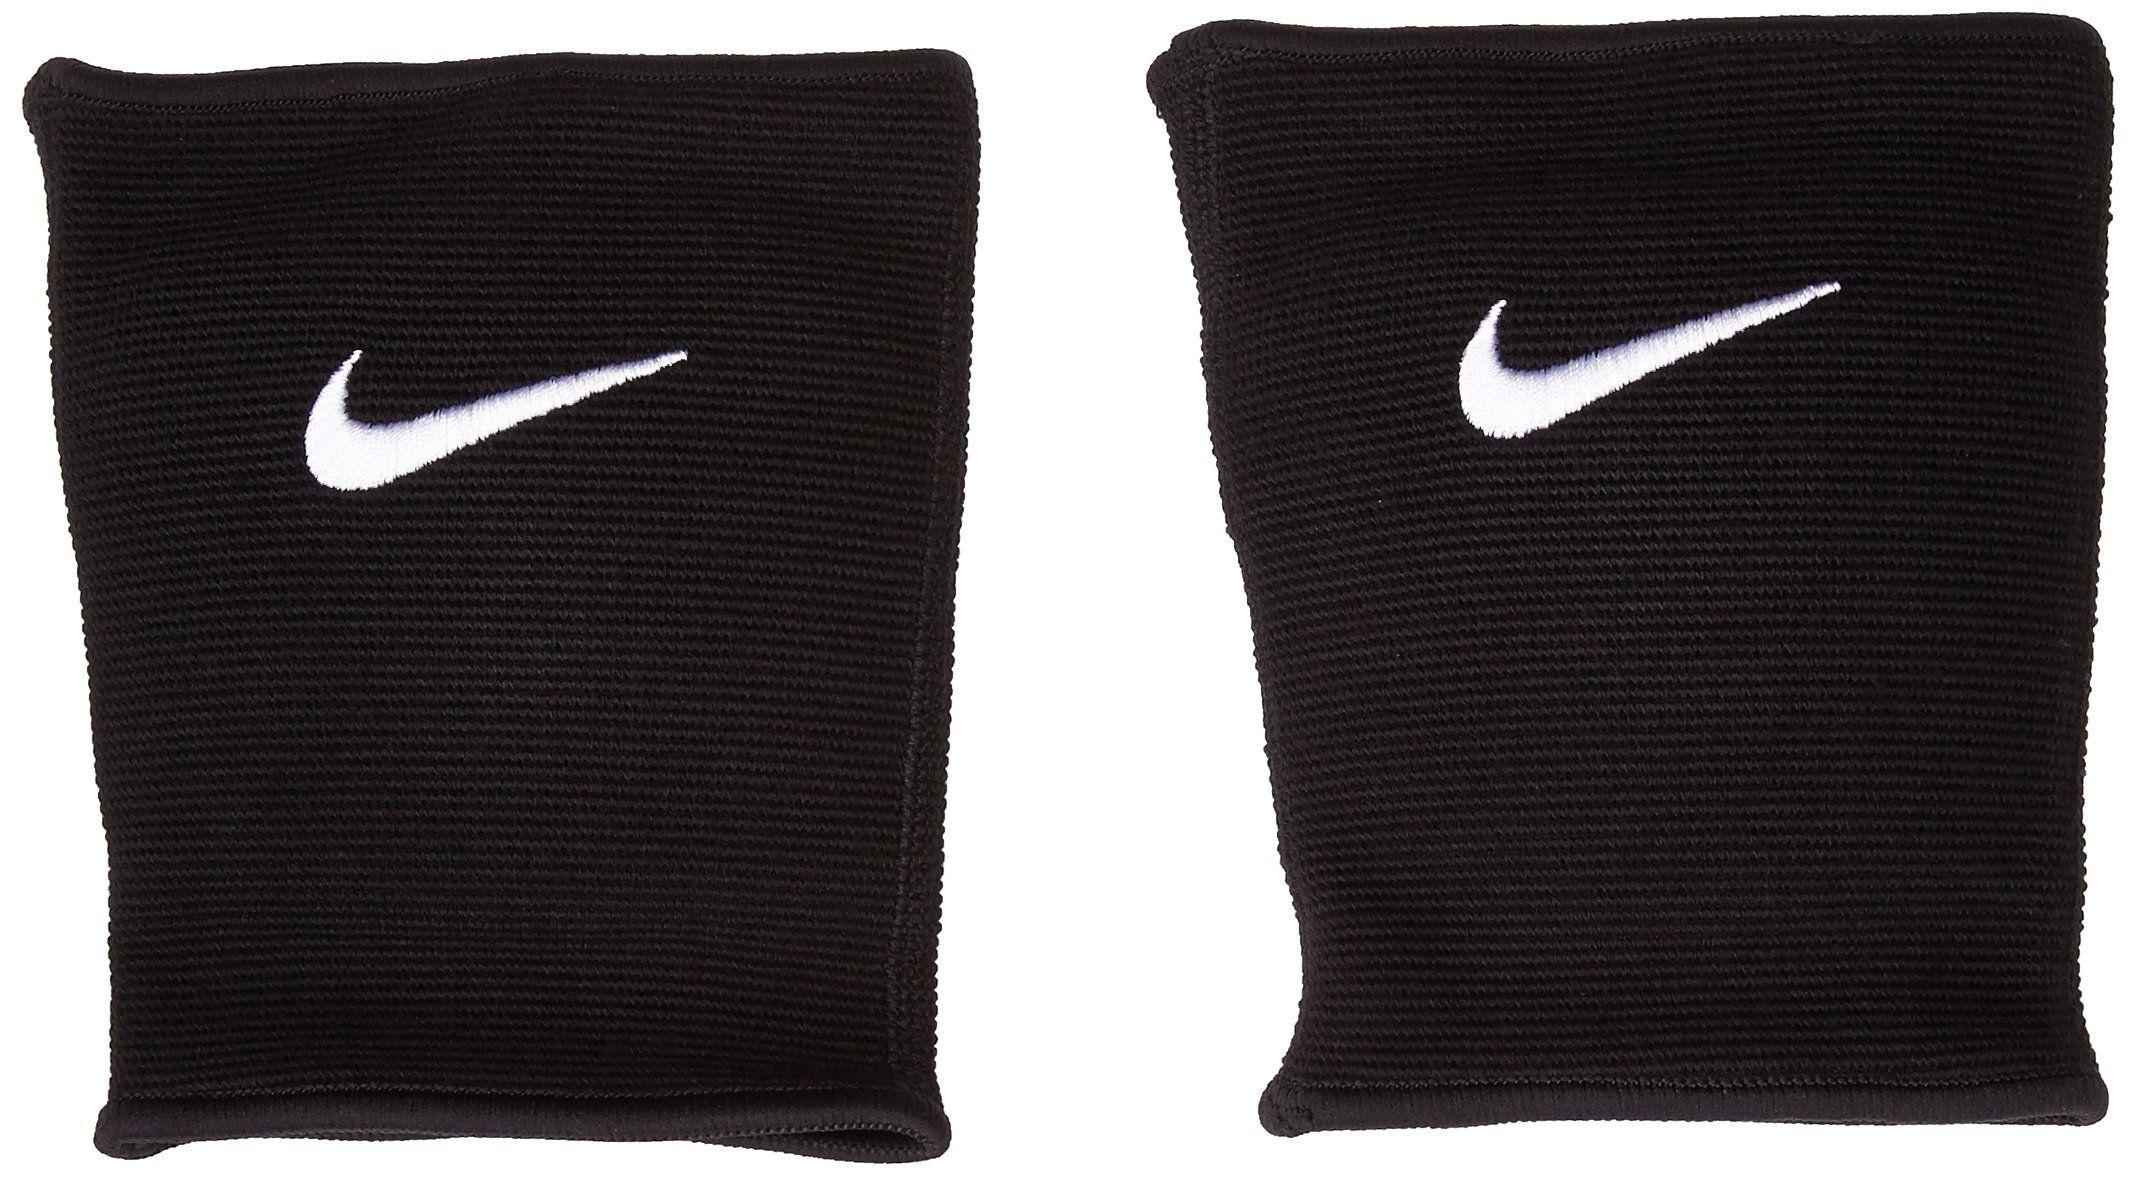 Nike Essentials Volleyball Knee Pad Black Medium Large Volleyball Knee Pads Basketball Knee Pads Knee Pads